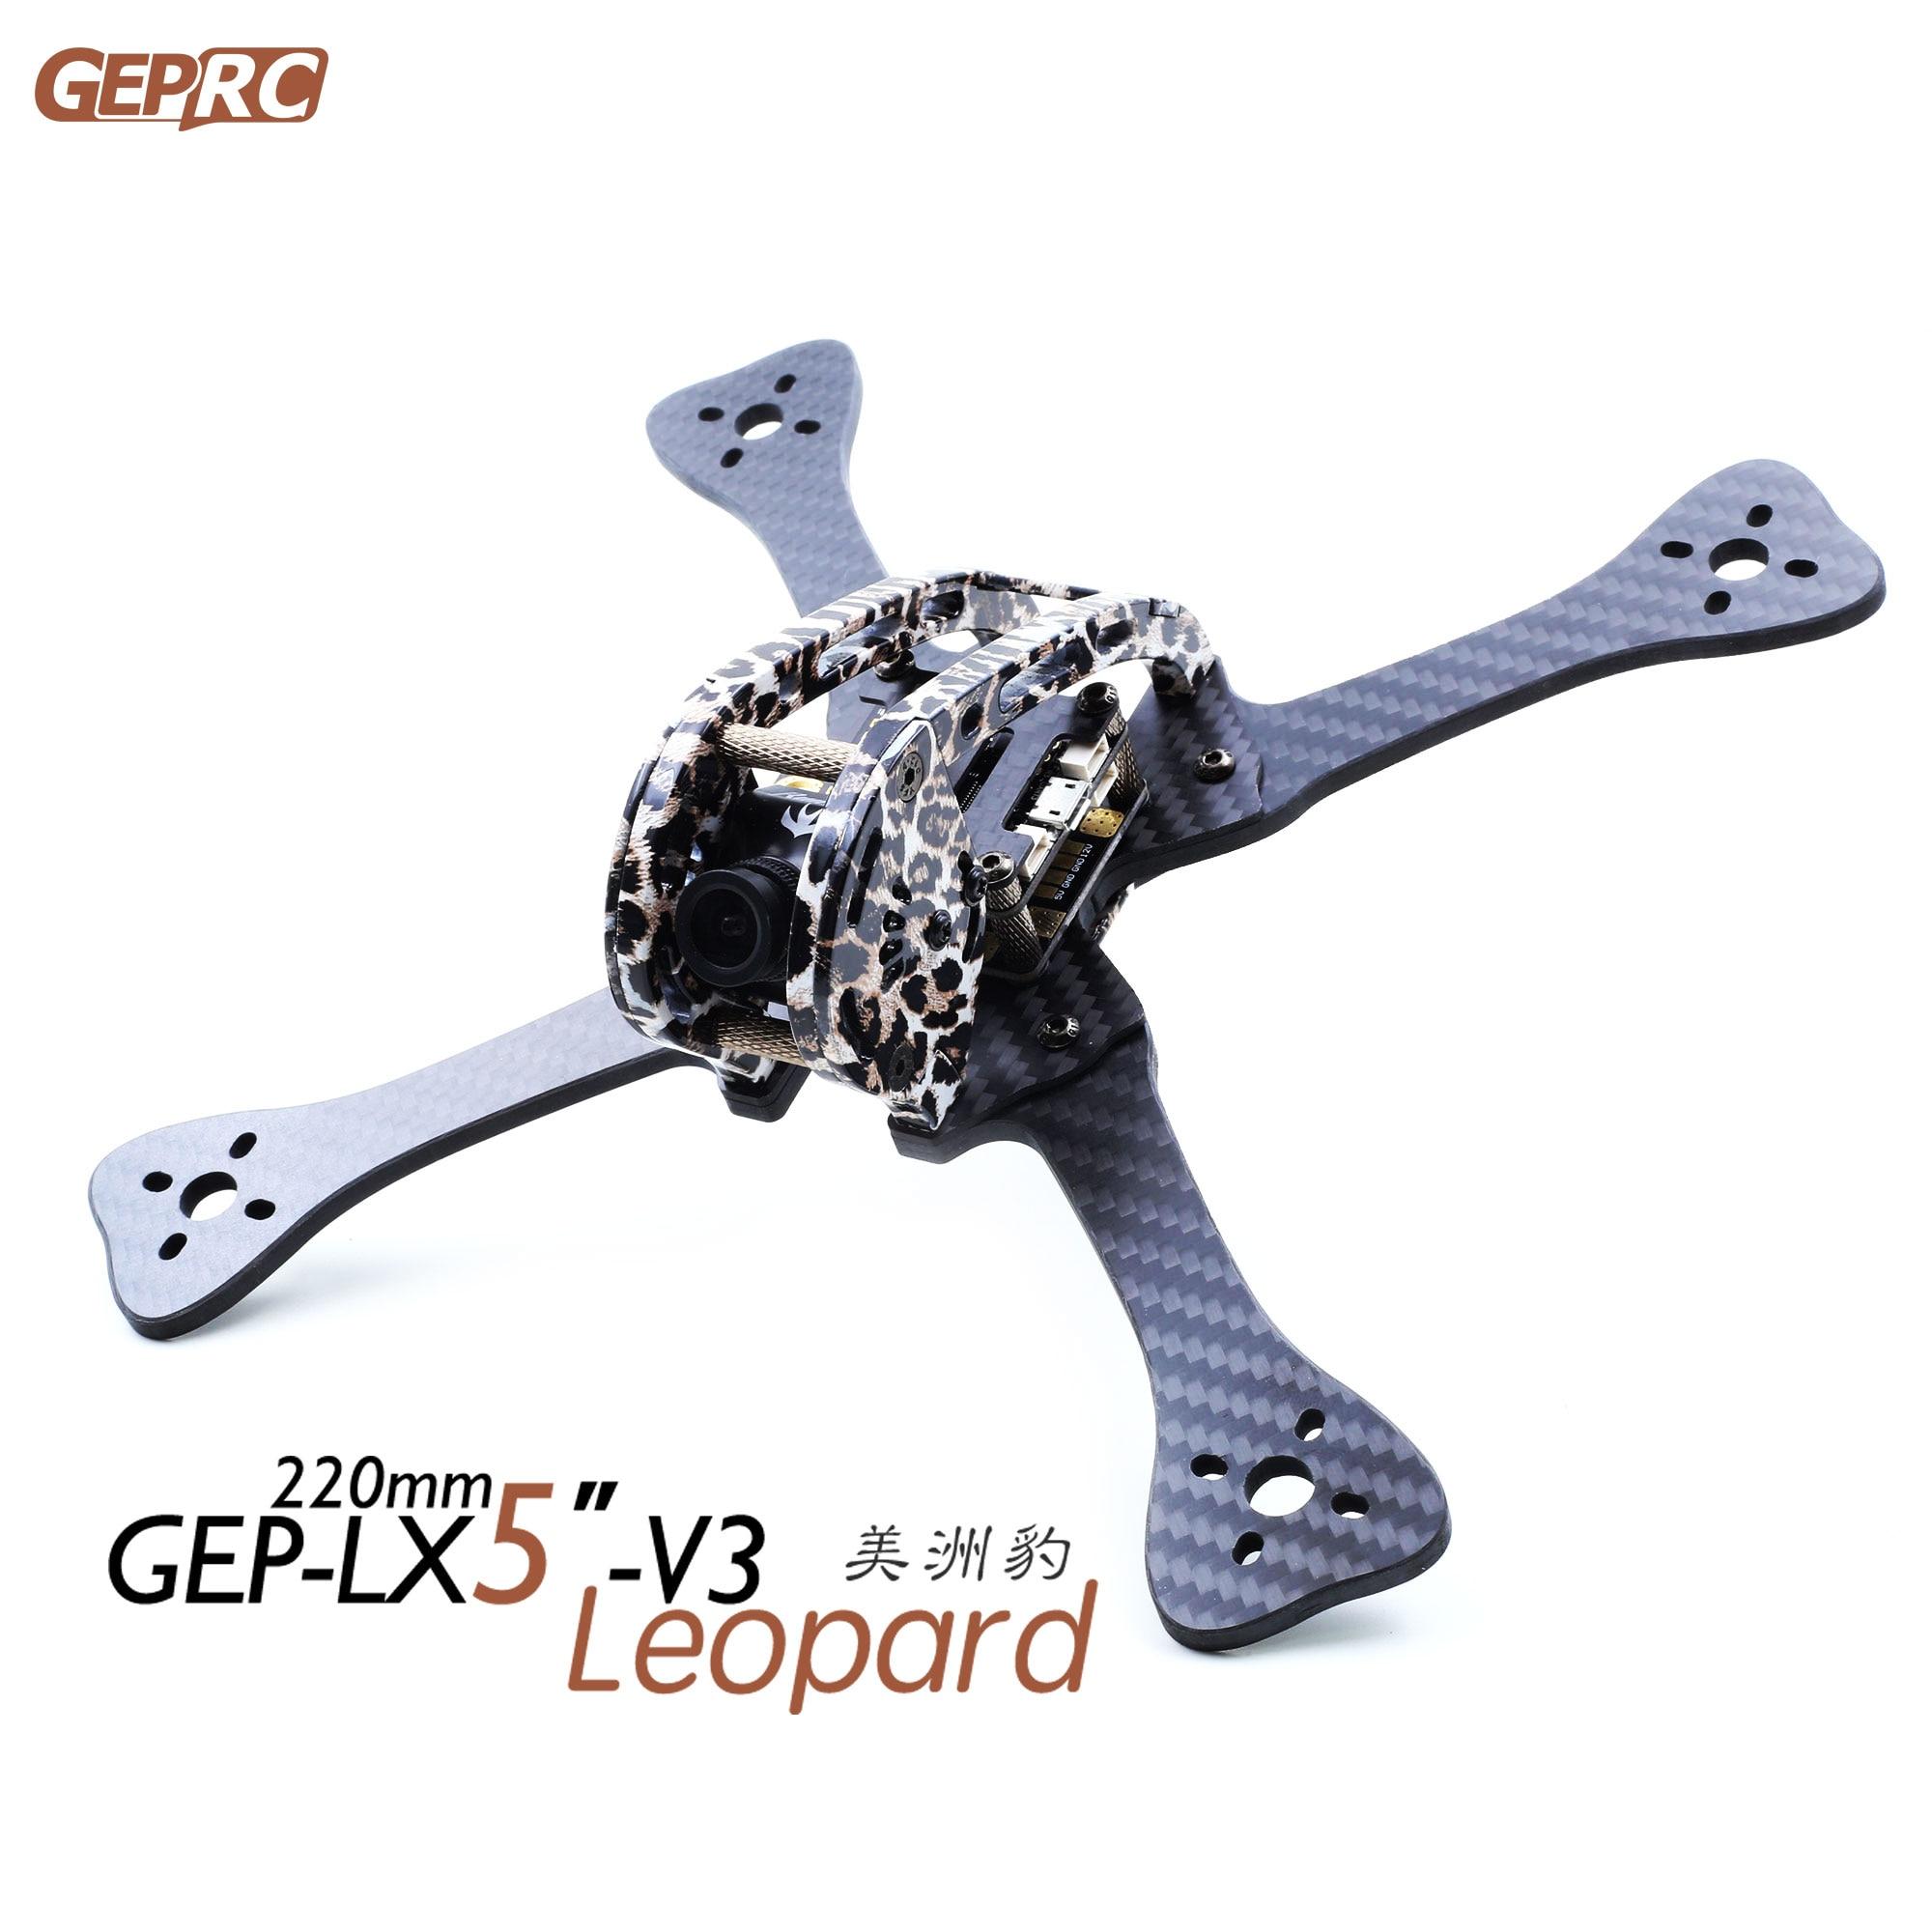 F-Cloud GEPRC/ GEP-LX5-V3 Leopard Jaguar 7075 aeronautical aluminum parts FPV traverser Leopard Print цены онлайн